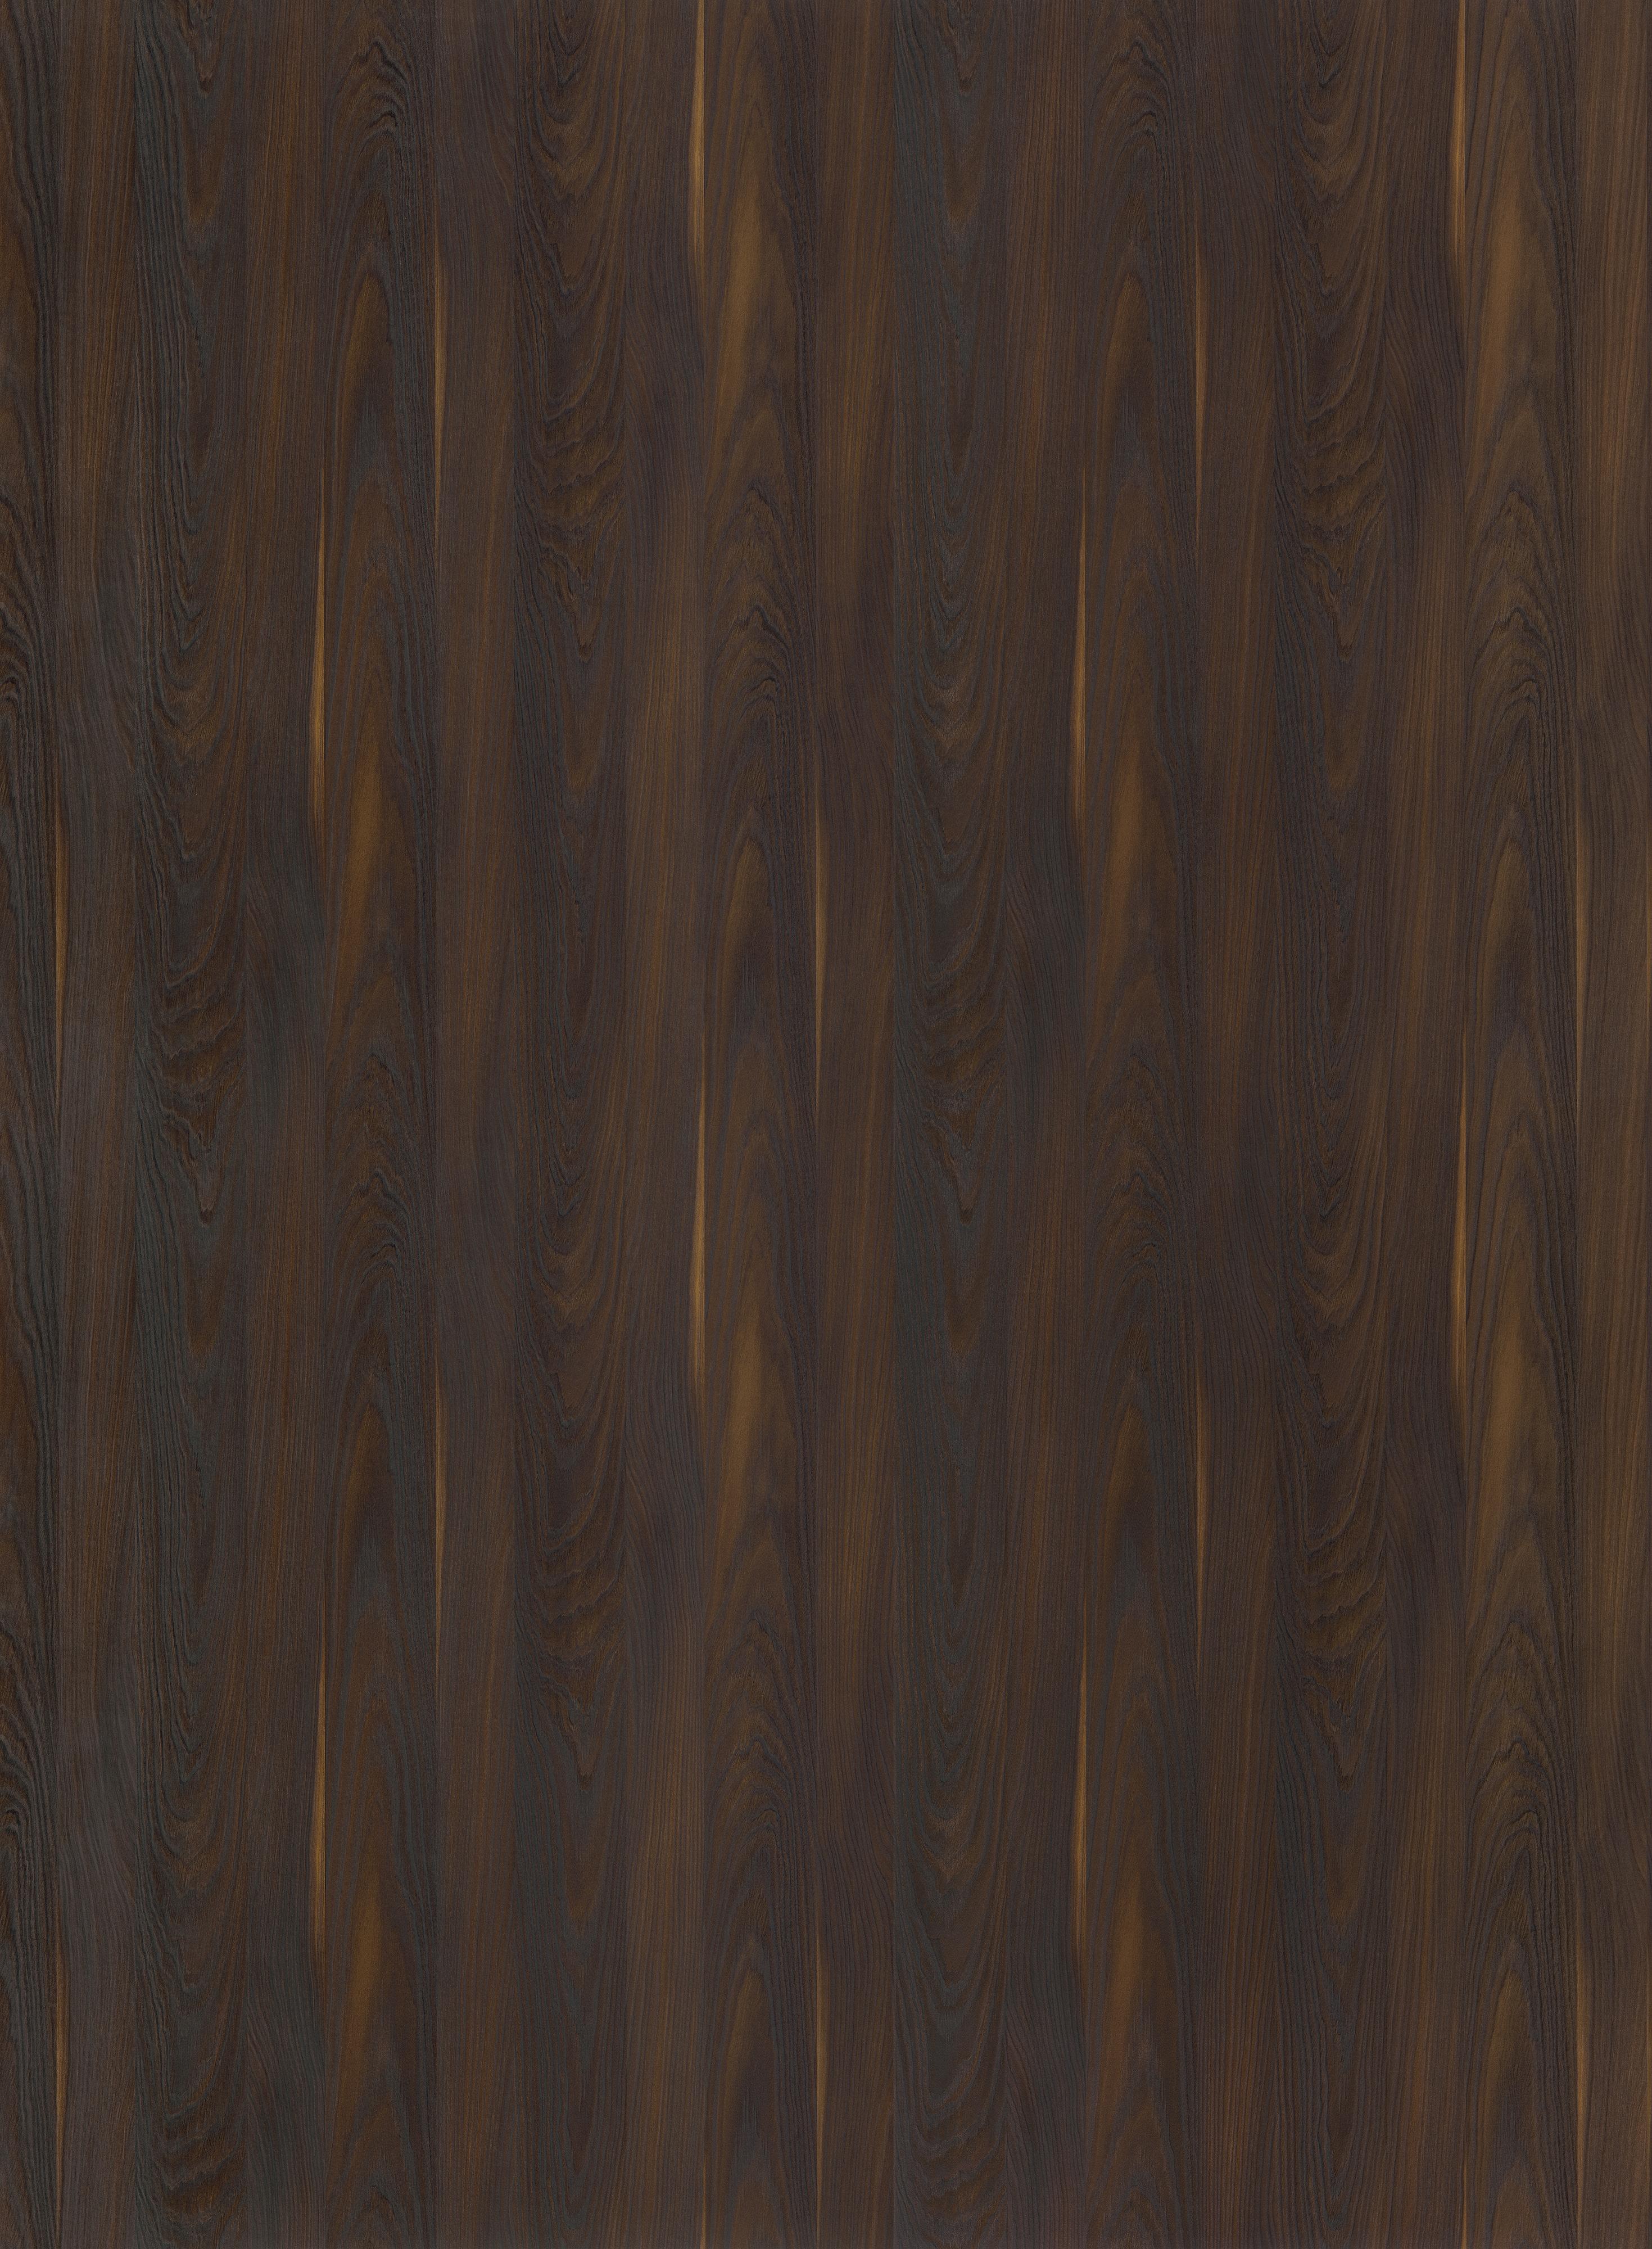 Cleaf/DecoLegno B011 Yosemite - Tekenprogramma 2800x2070mm